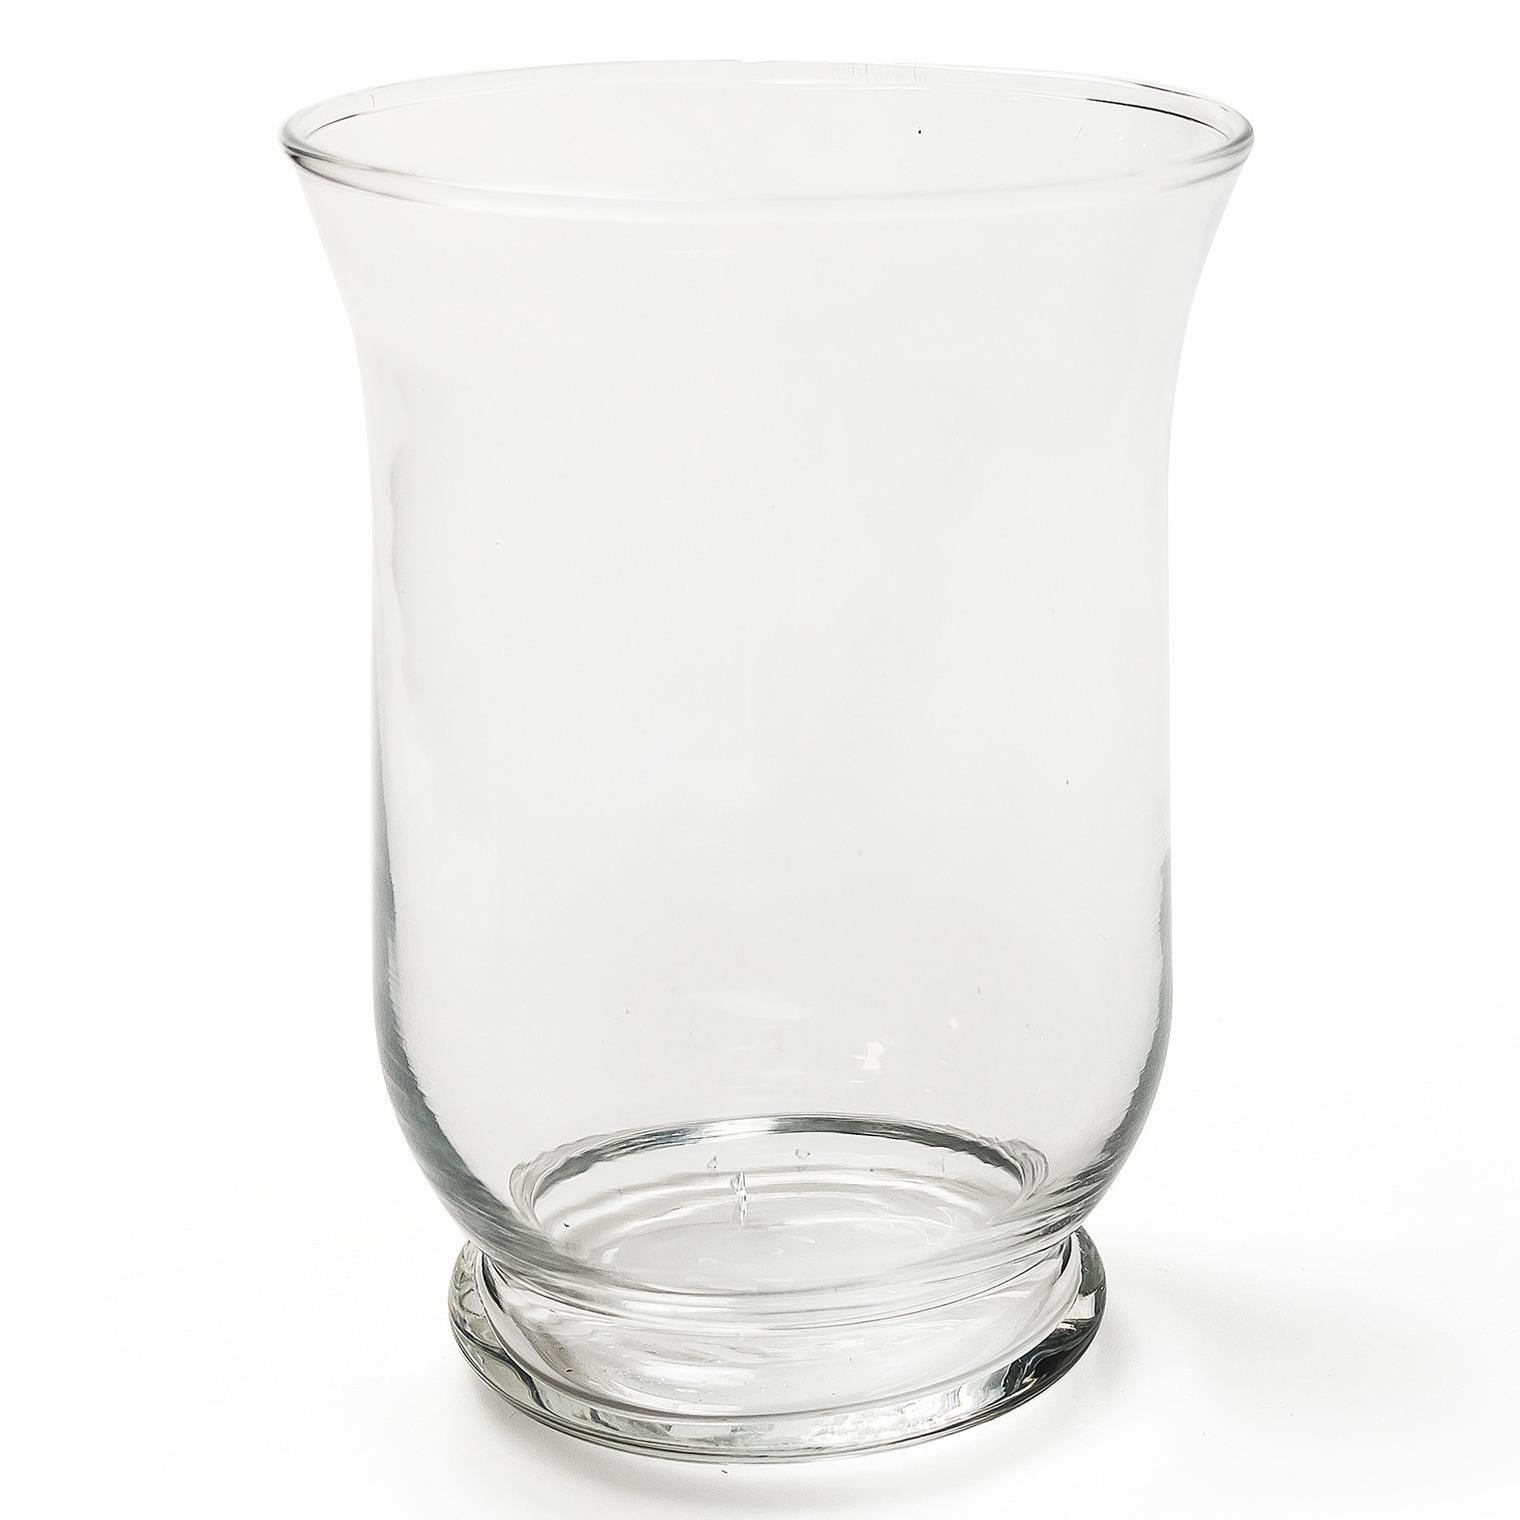 Transparante windlicht kaarsenhouder van glas 11 x 15 cm